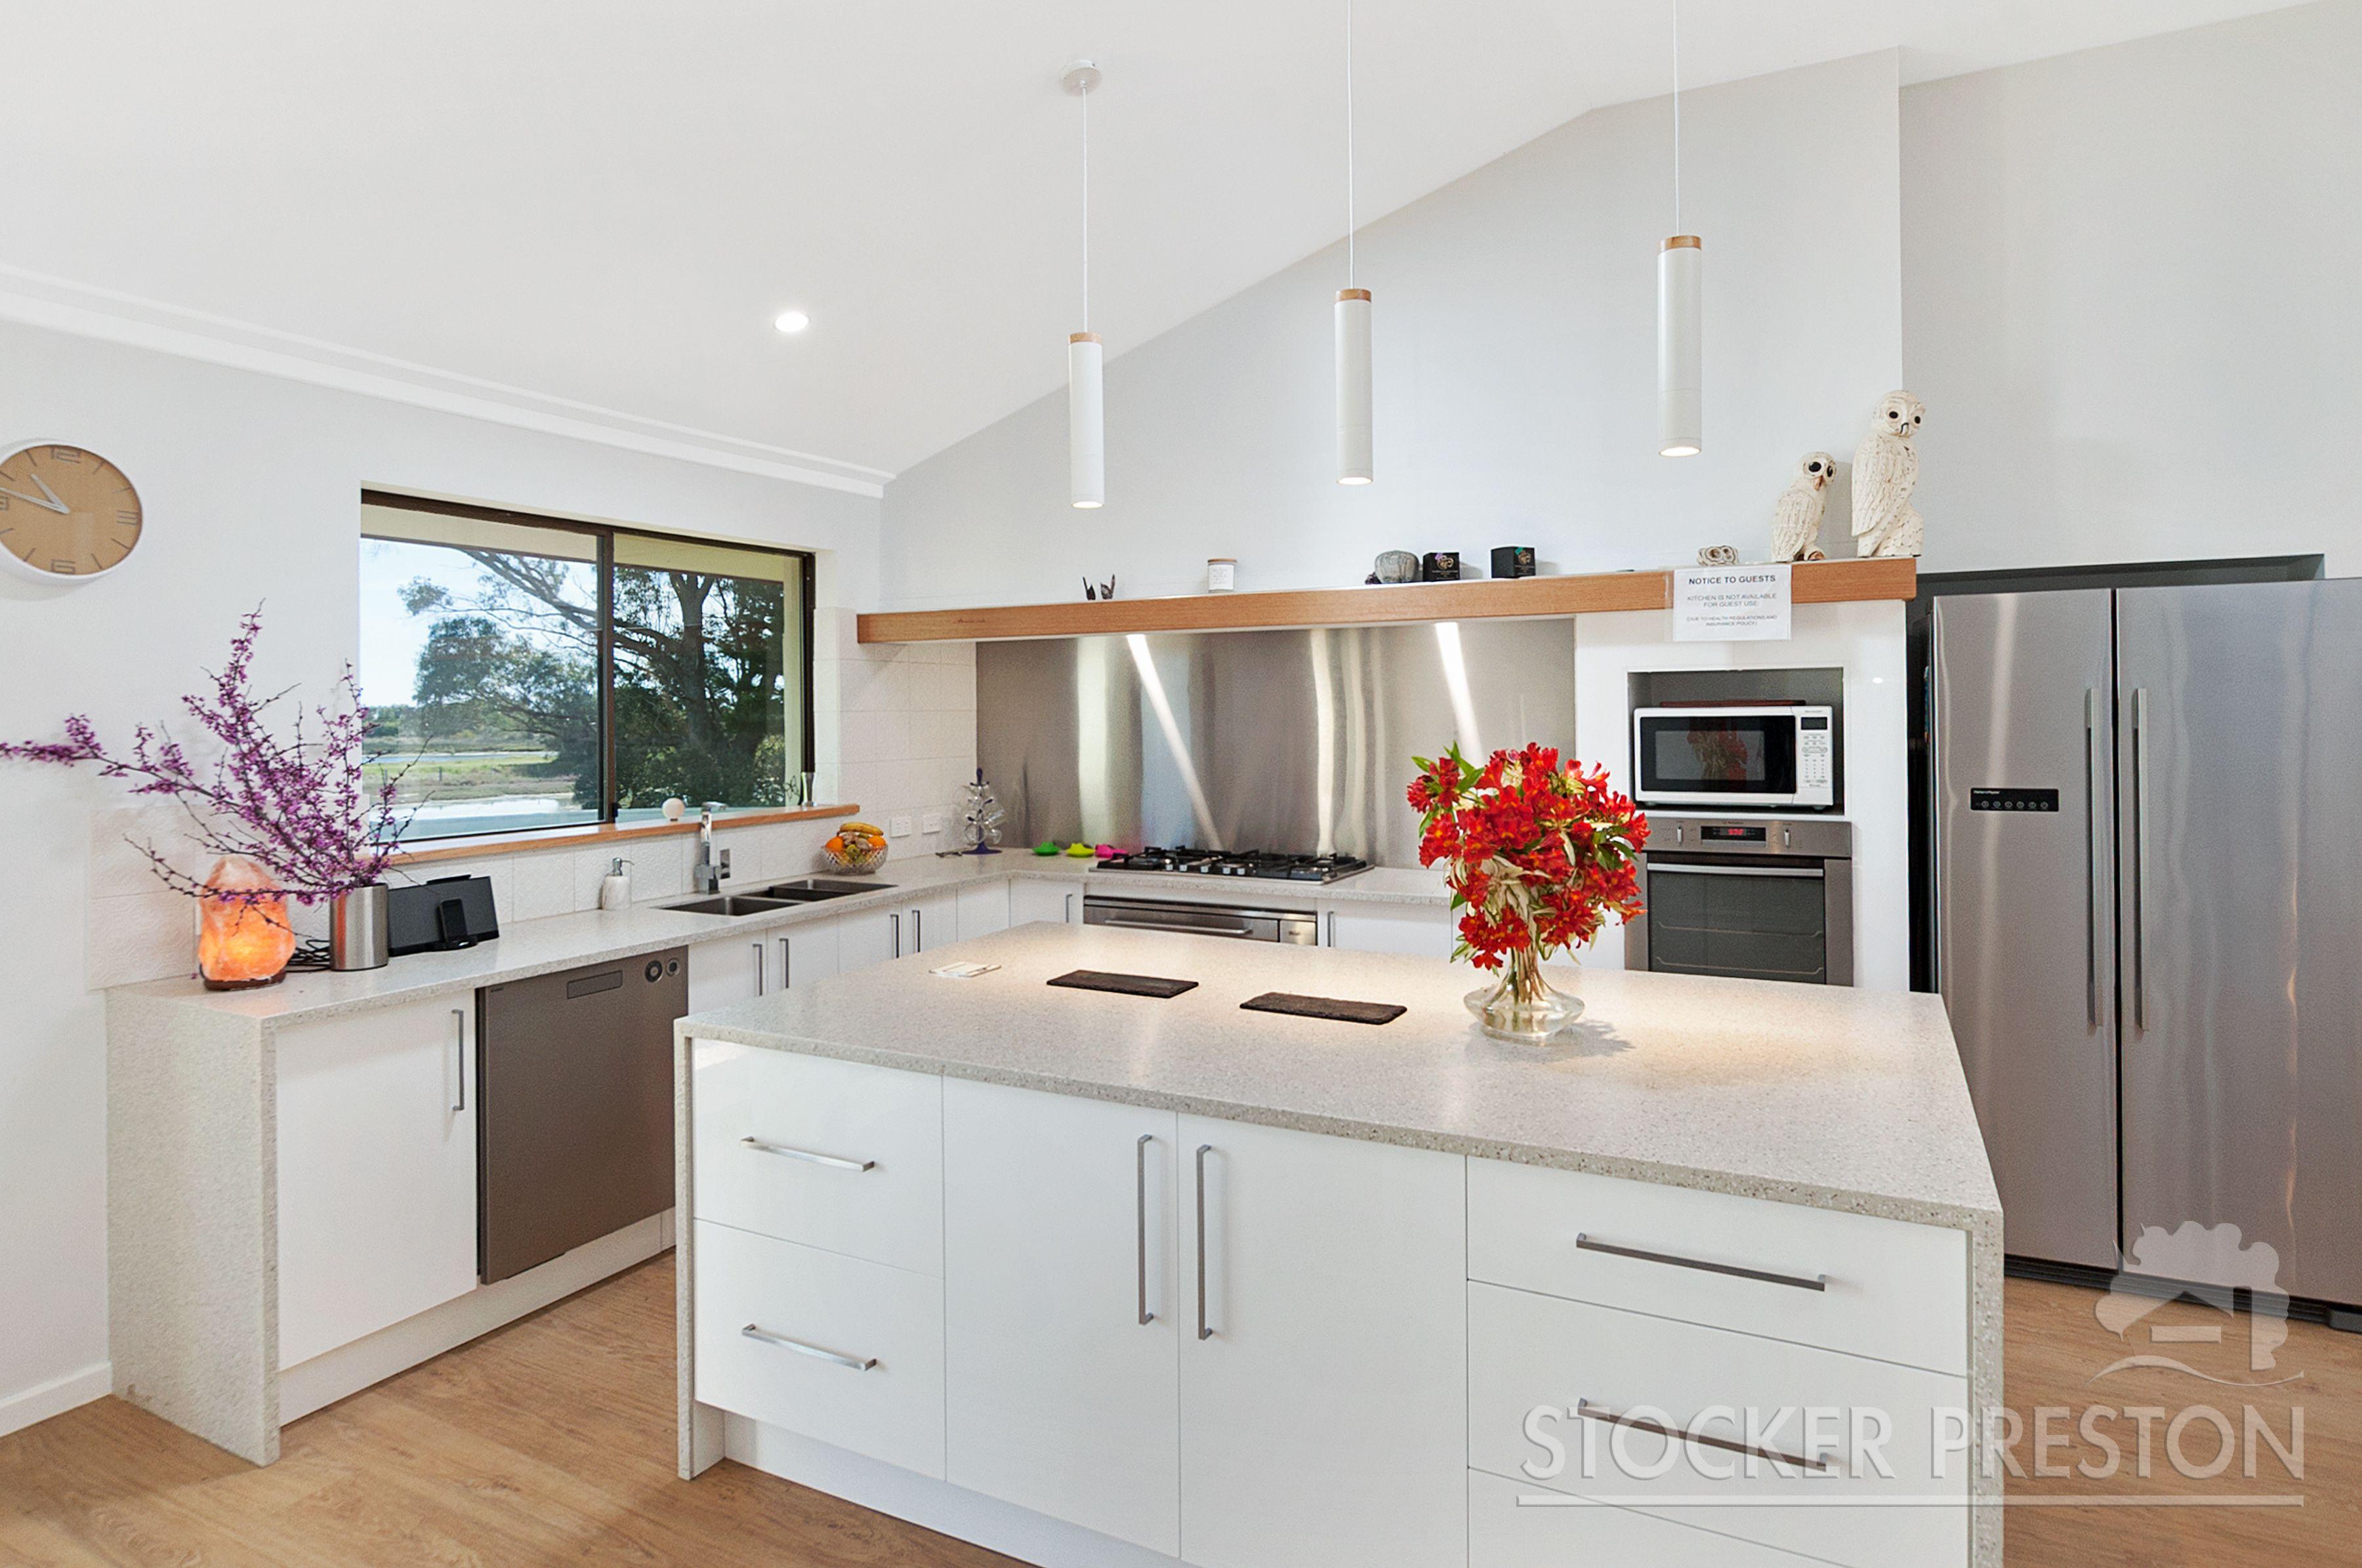 Wonnerup , WA WA 6280 - House For Sale #3901266 - australianrural.com.au